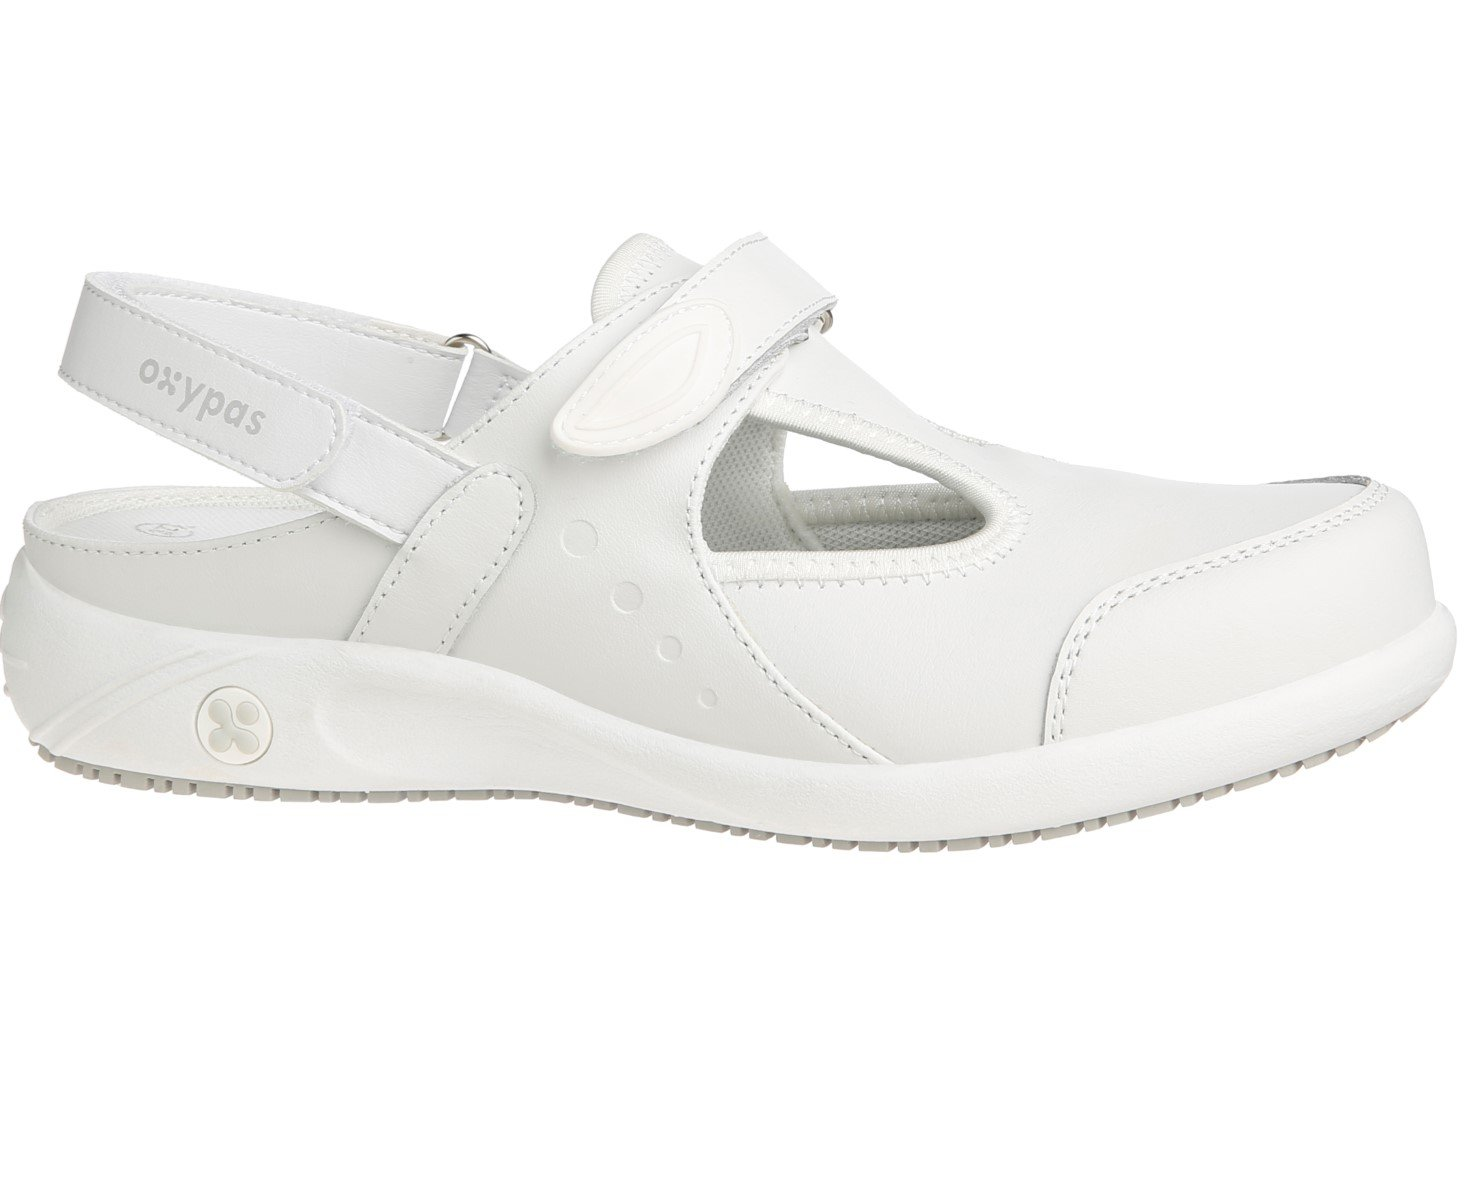 Oxypas Move Carin Slip-resistant, Slip-resistant, Slip-resistant, Antistatic Nursing scarpe, bianca (Wht) , 8 UK (EU  42) 5c30d3